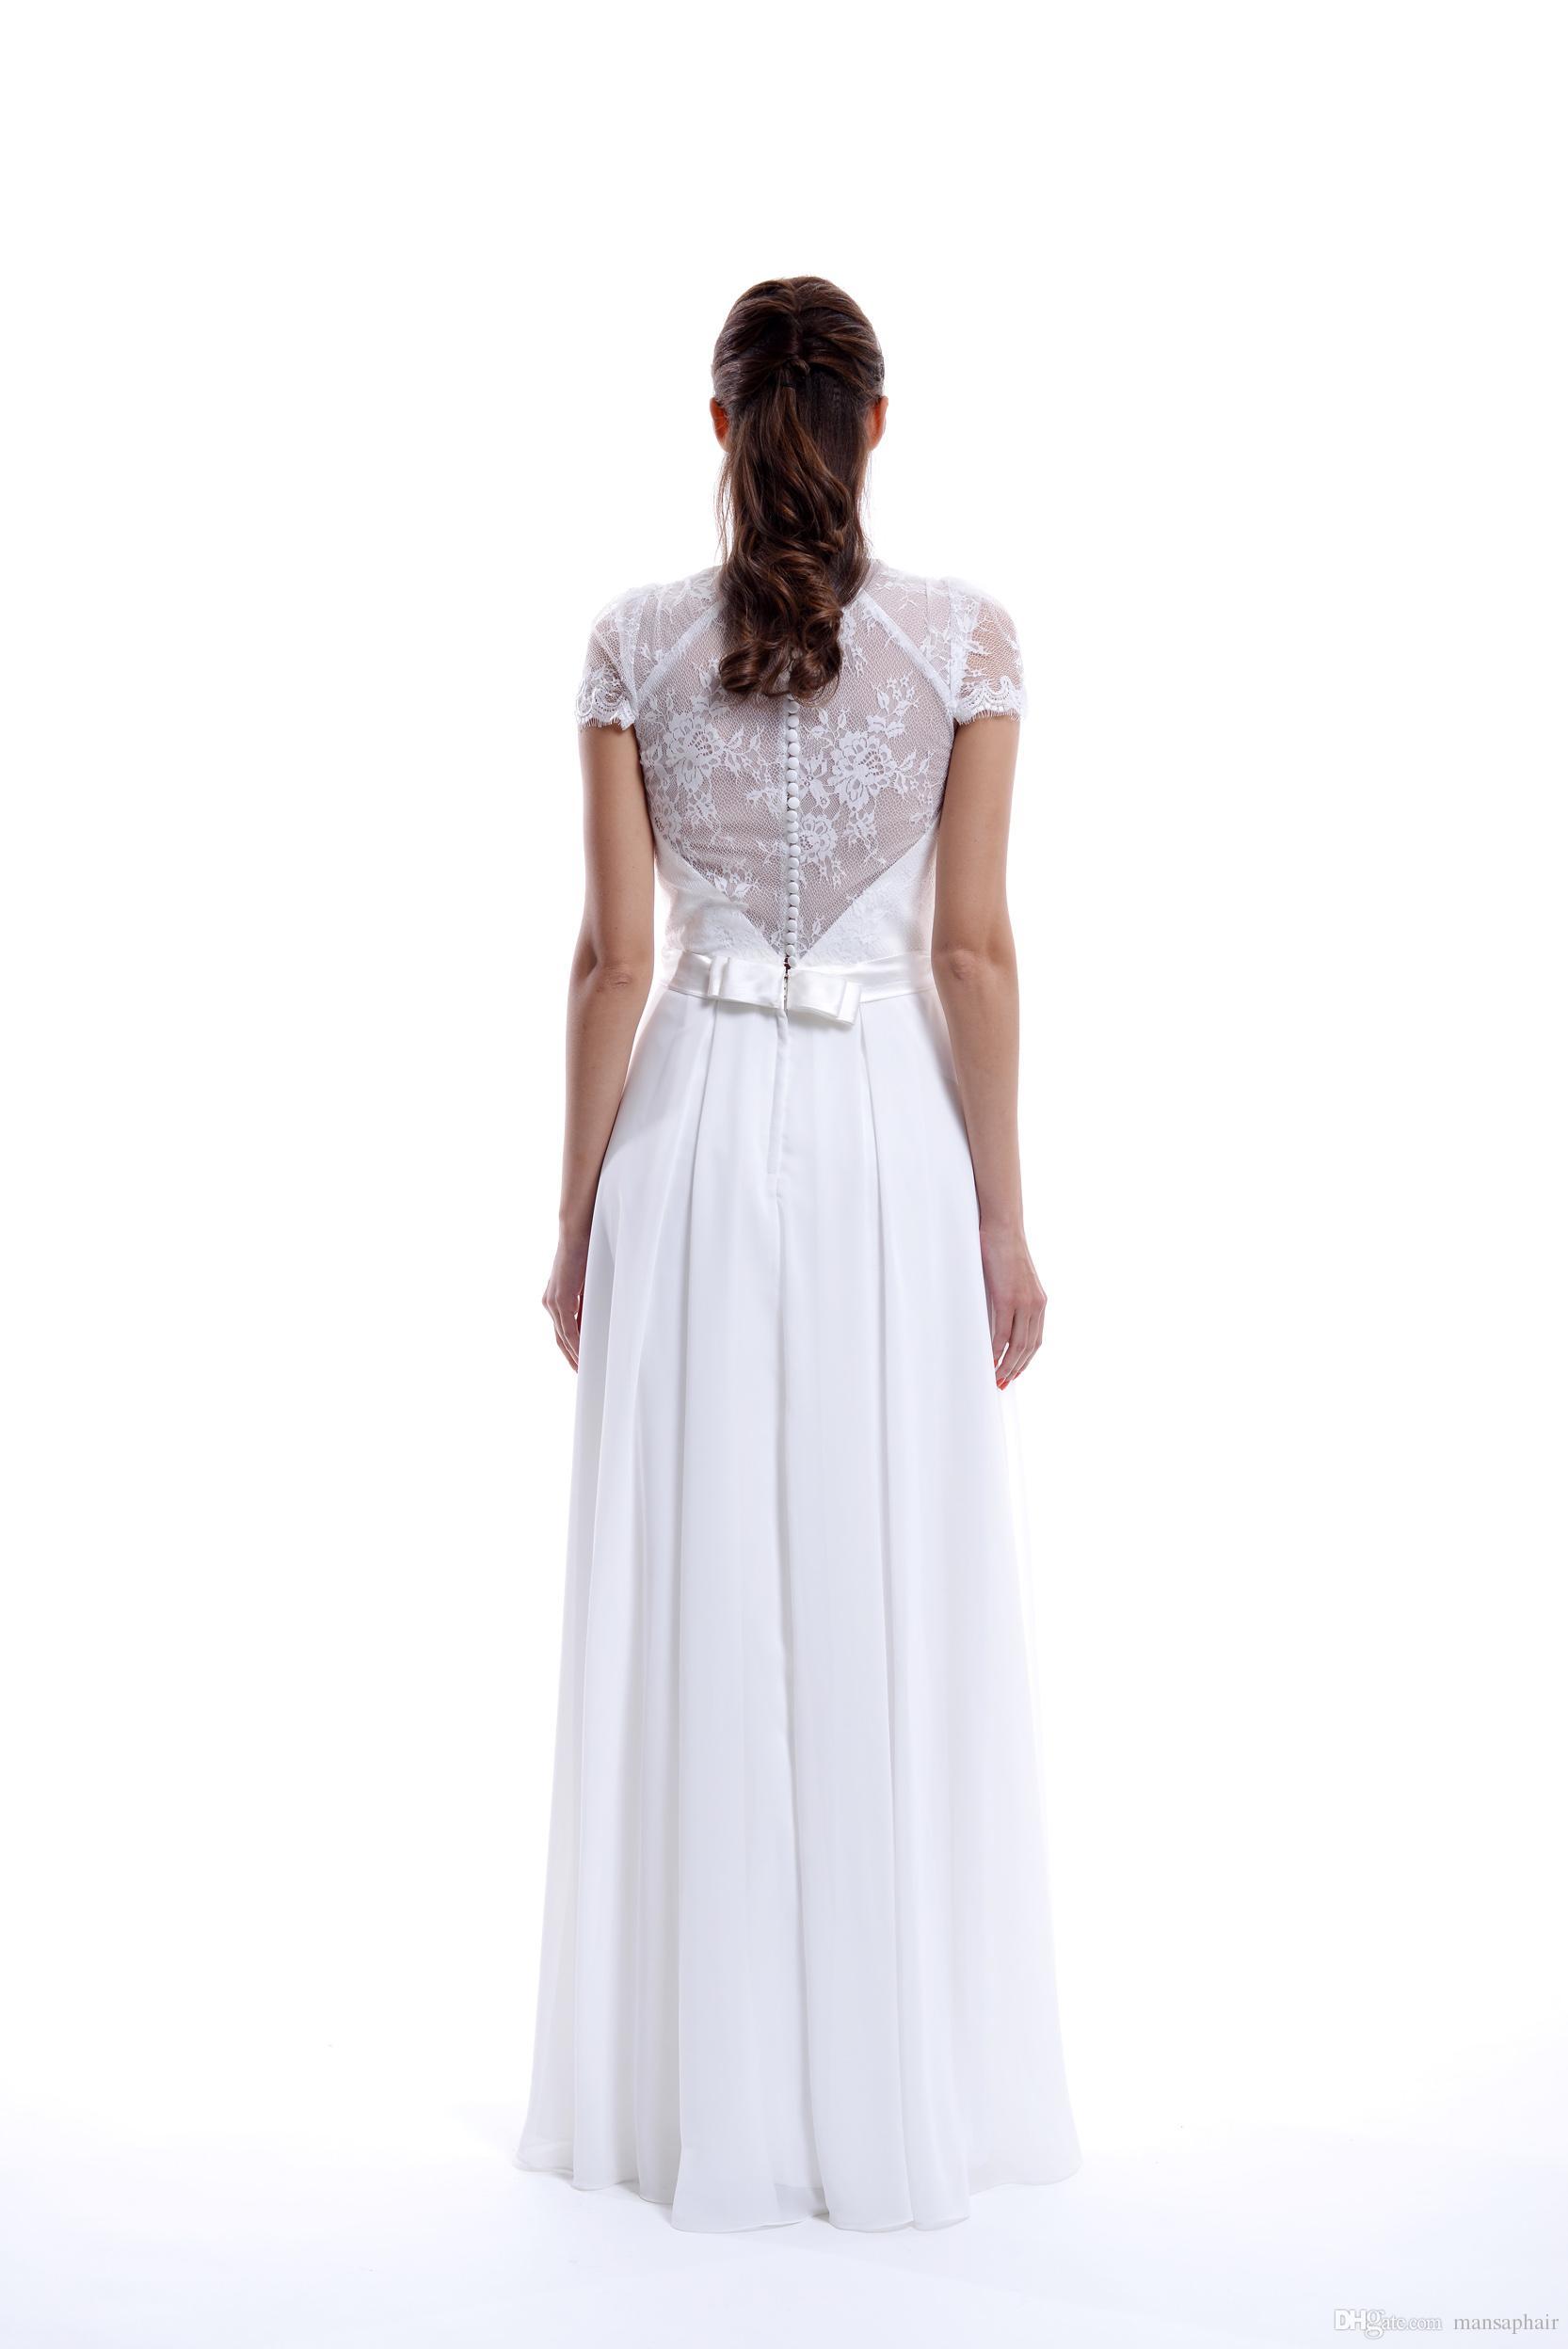 2018 Elegant Country Lace Wedding Dresses Mermaid V Neck Cap Sleeve Modest Wedding Bridal Gowns Cheap Country A Line Wedding Dresses